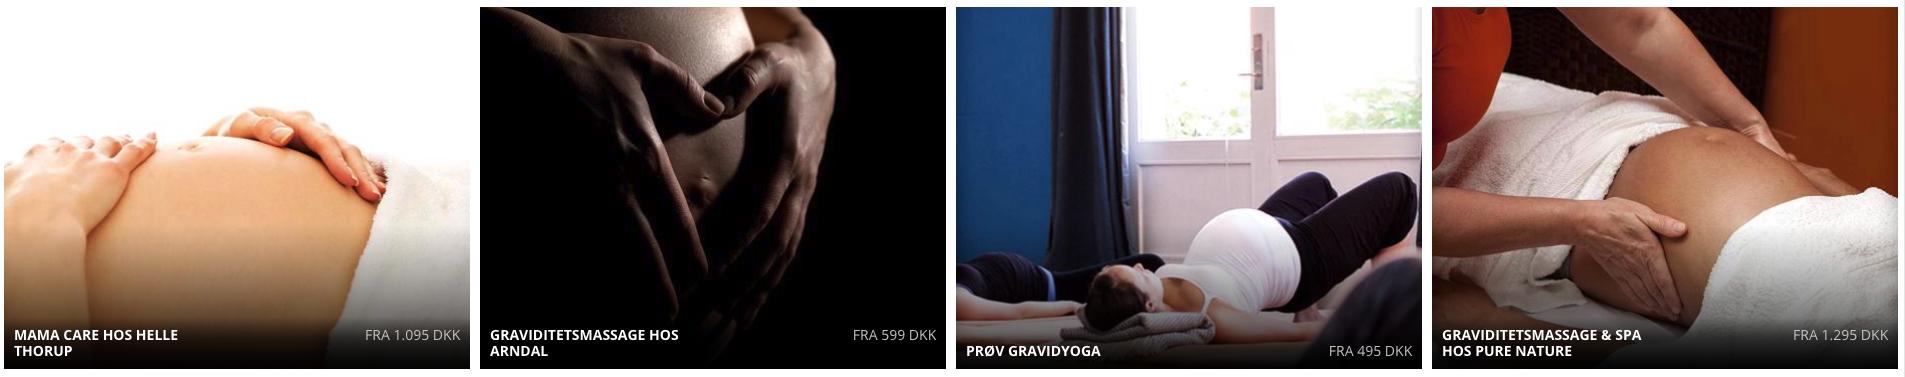 gravid massage